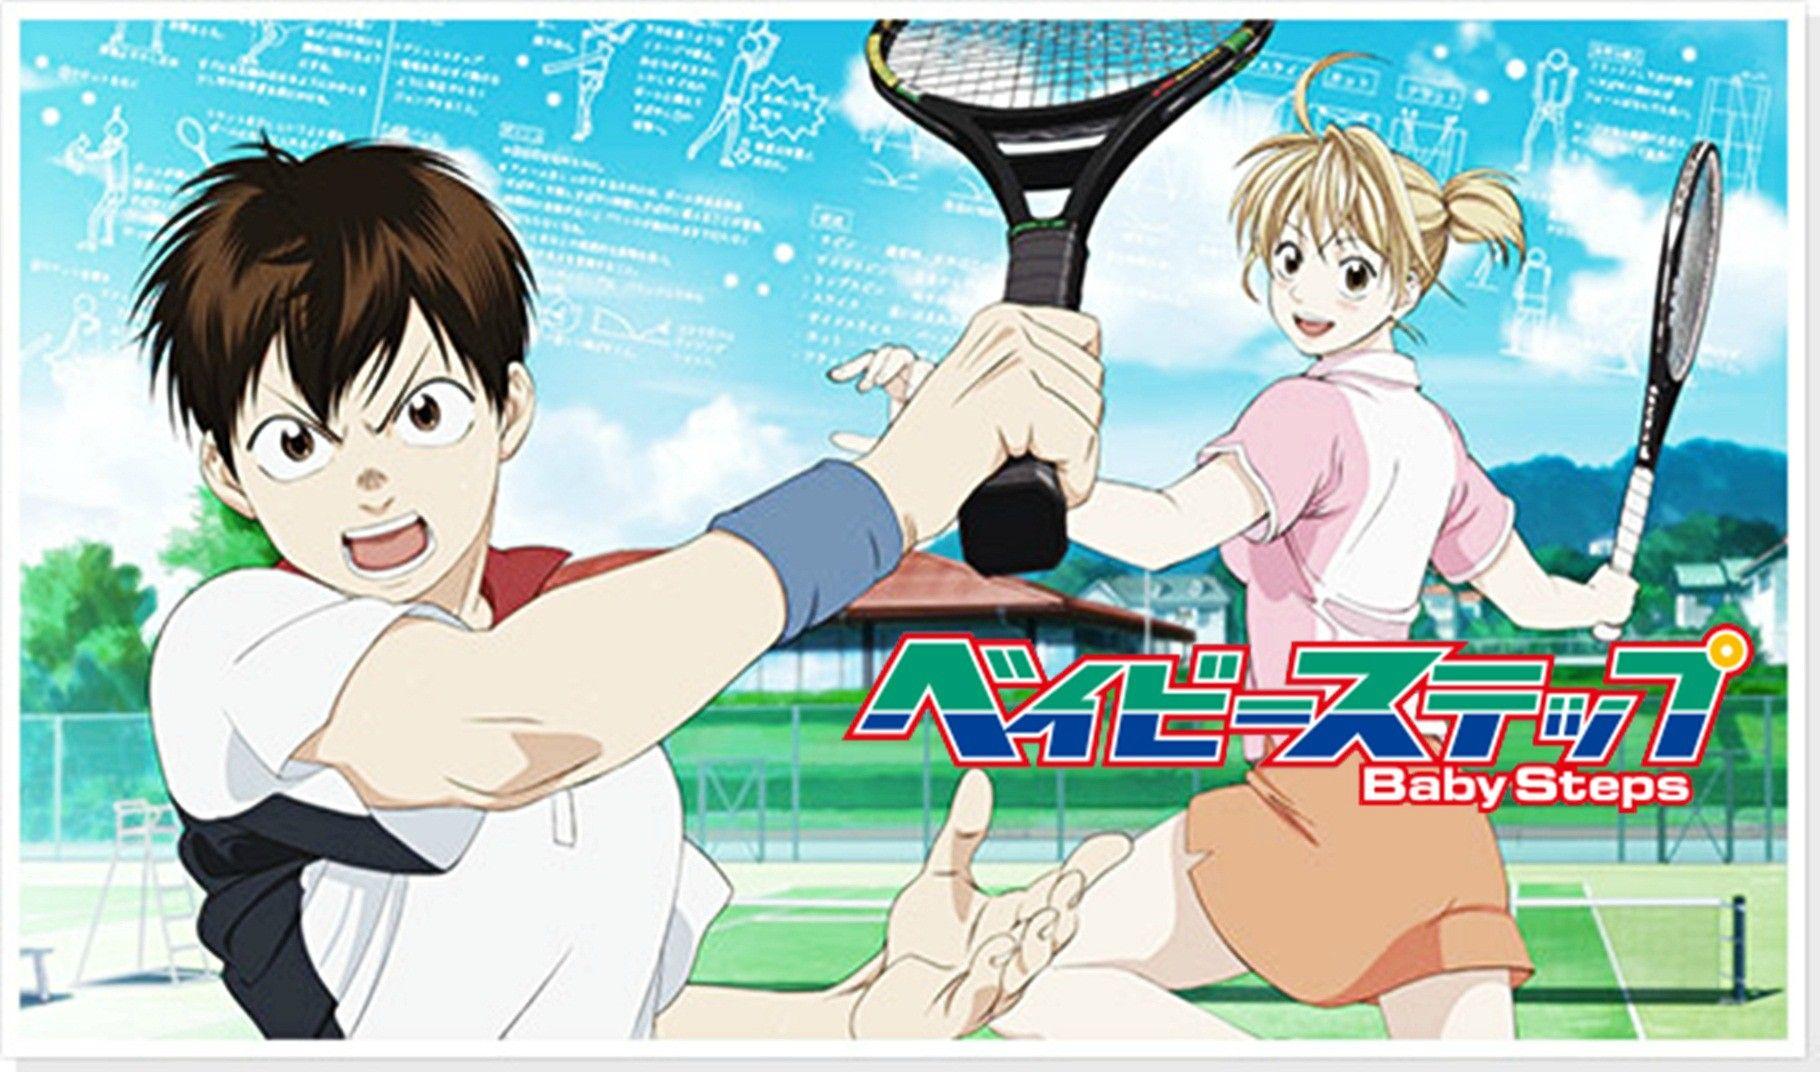 anime beatless episode 01 24 batch subtitle indonesia.html